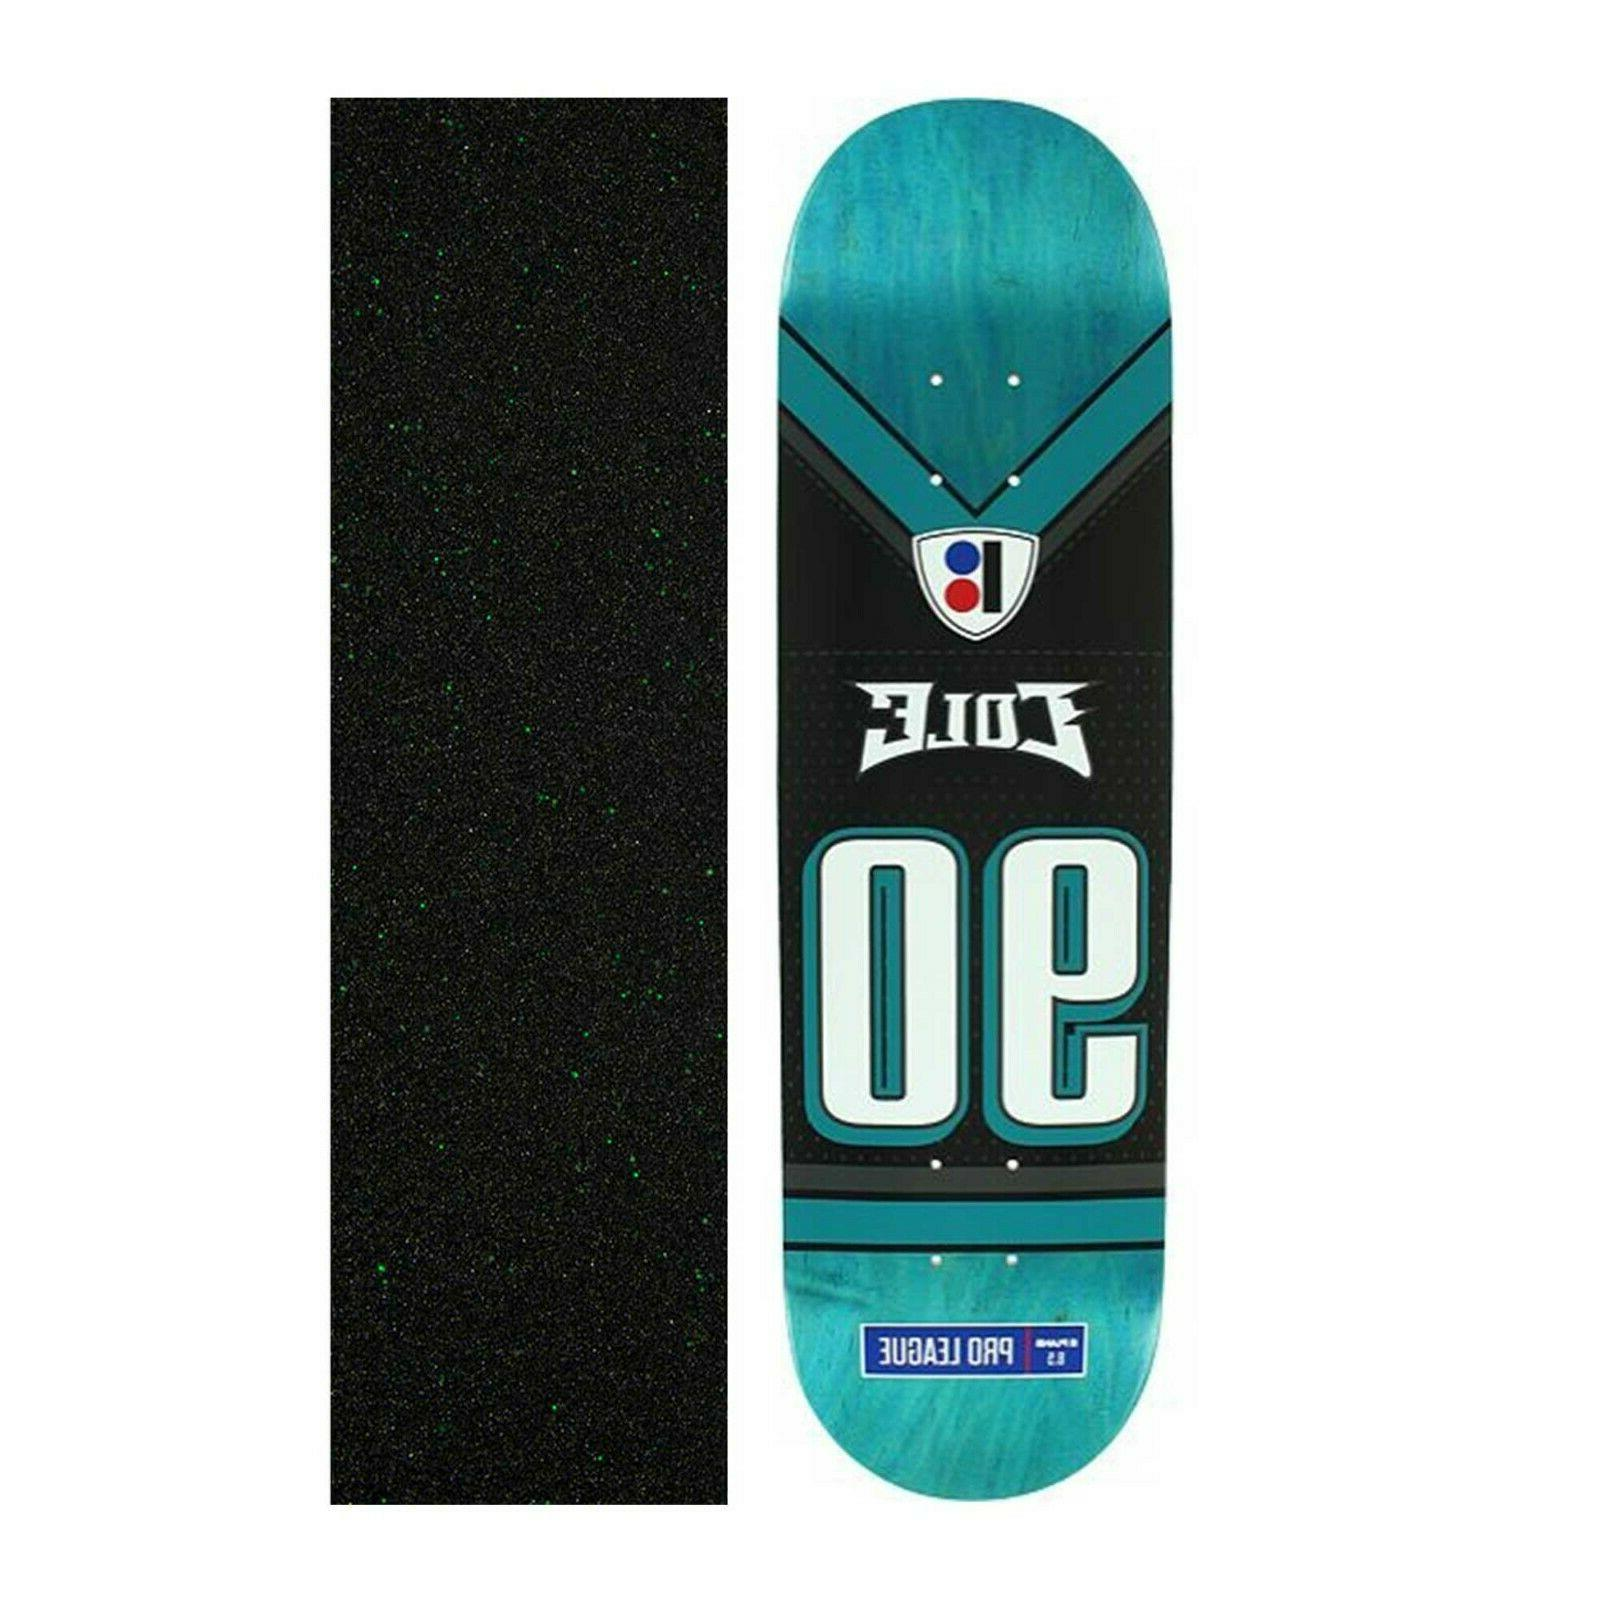 8 5 cole super roll skateboard deck